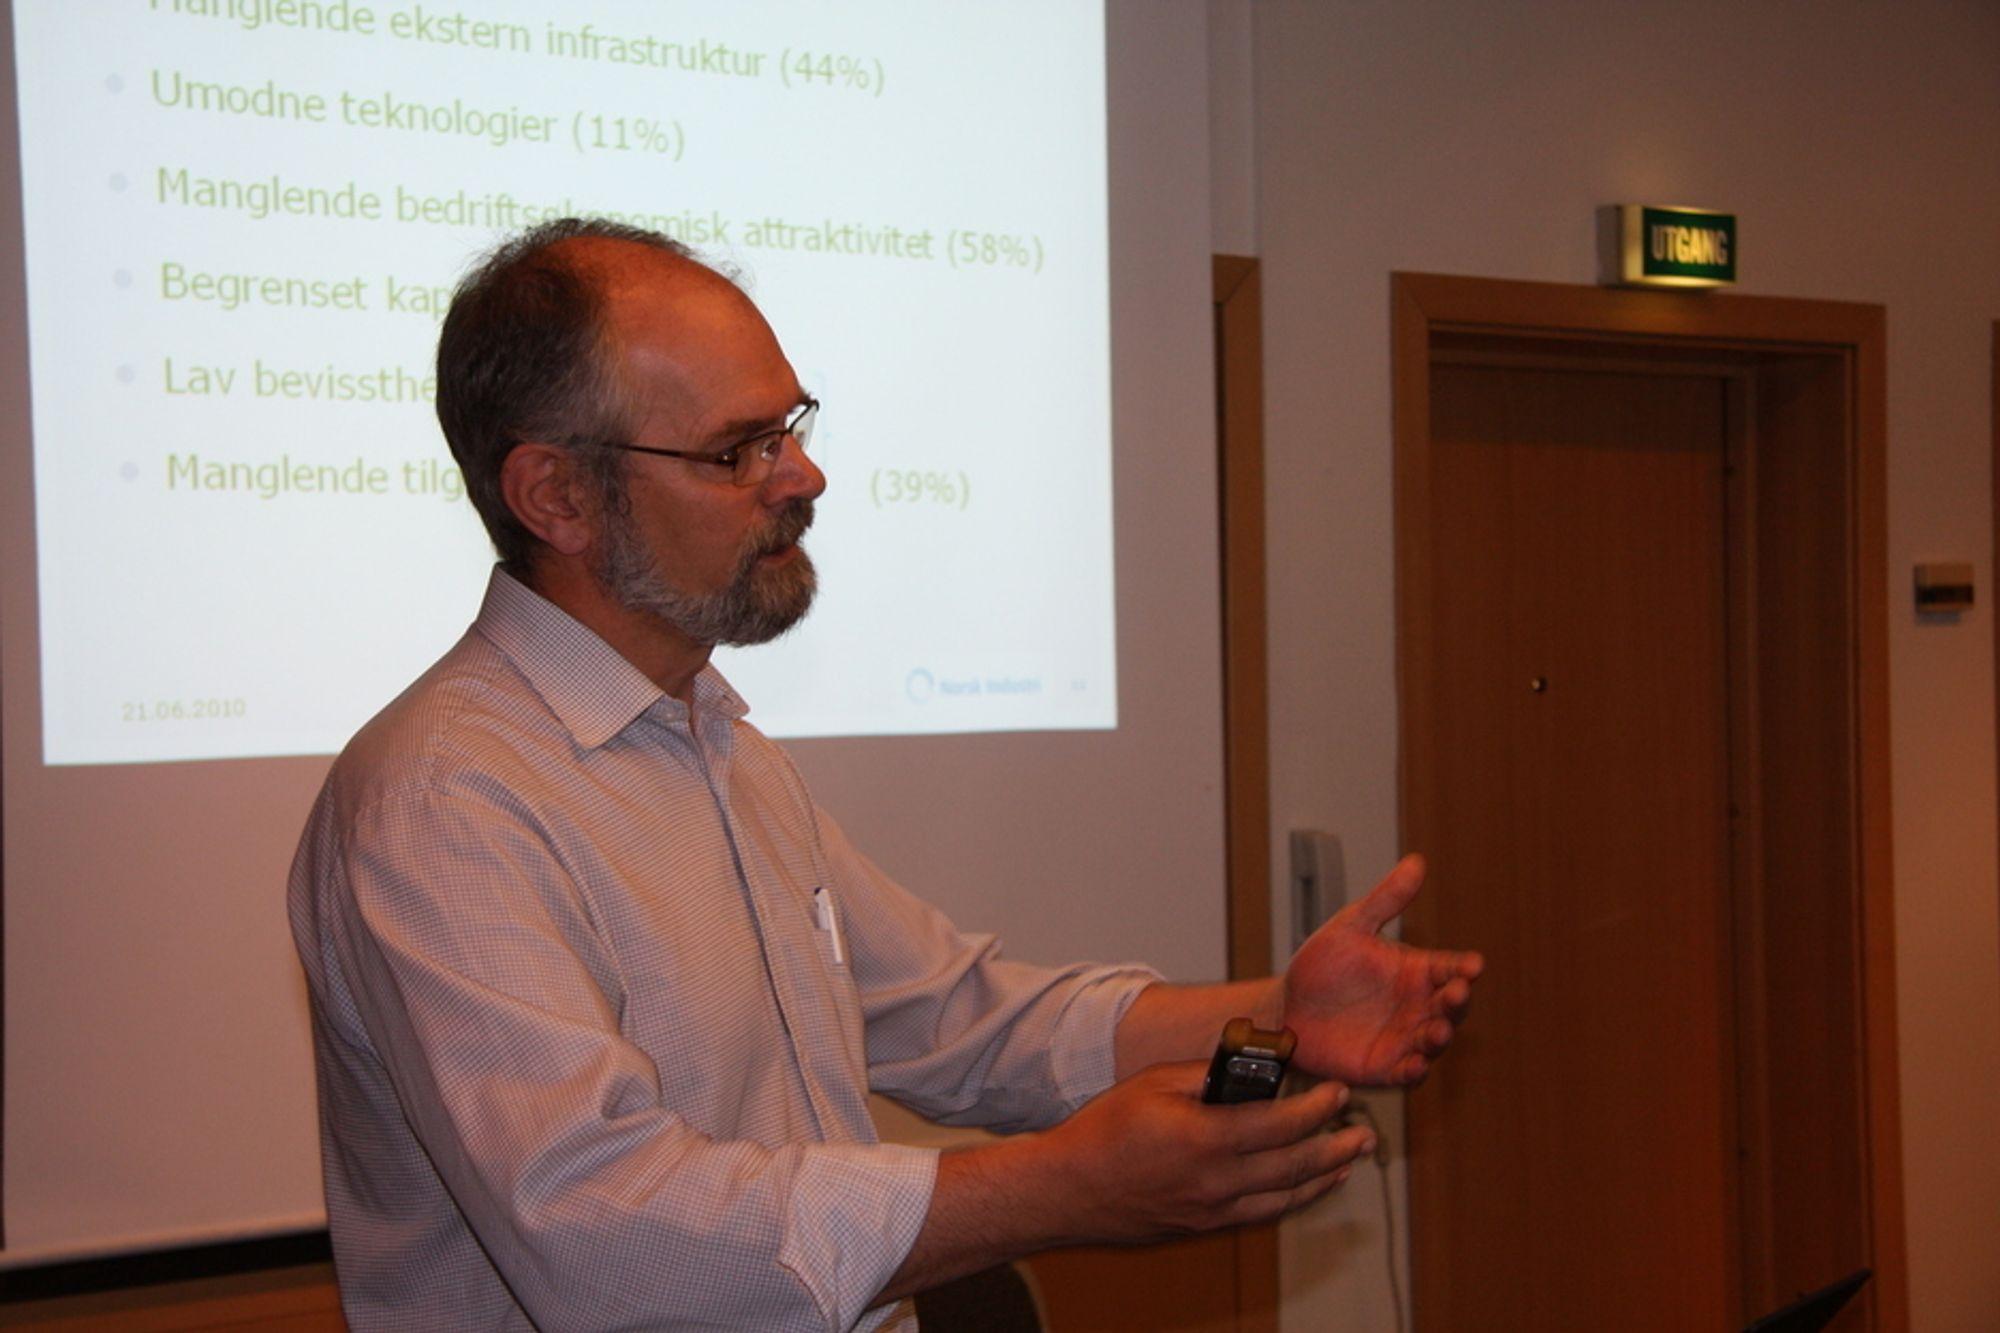 Den tidligere Krf-politikeren Bror Yngve Rahm snakker nå varmt for norsk industri.